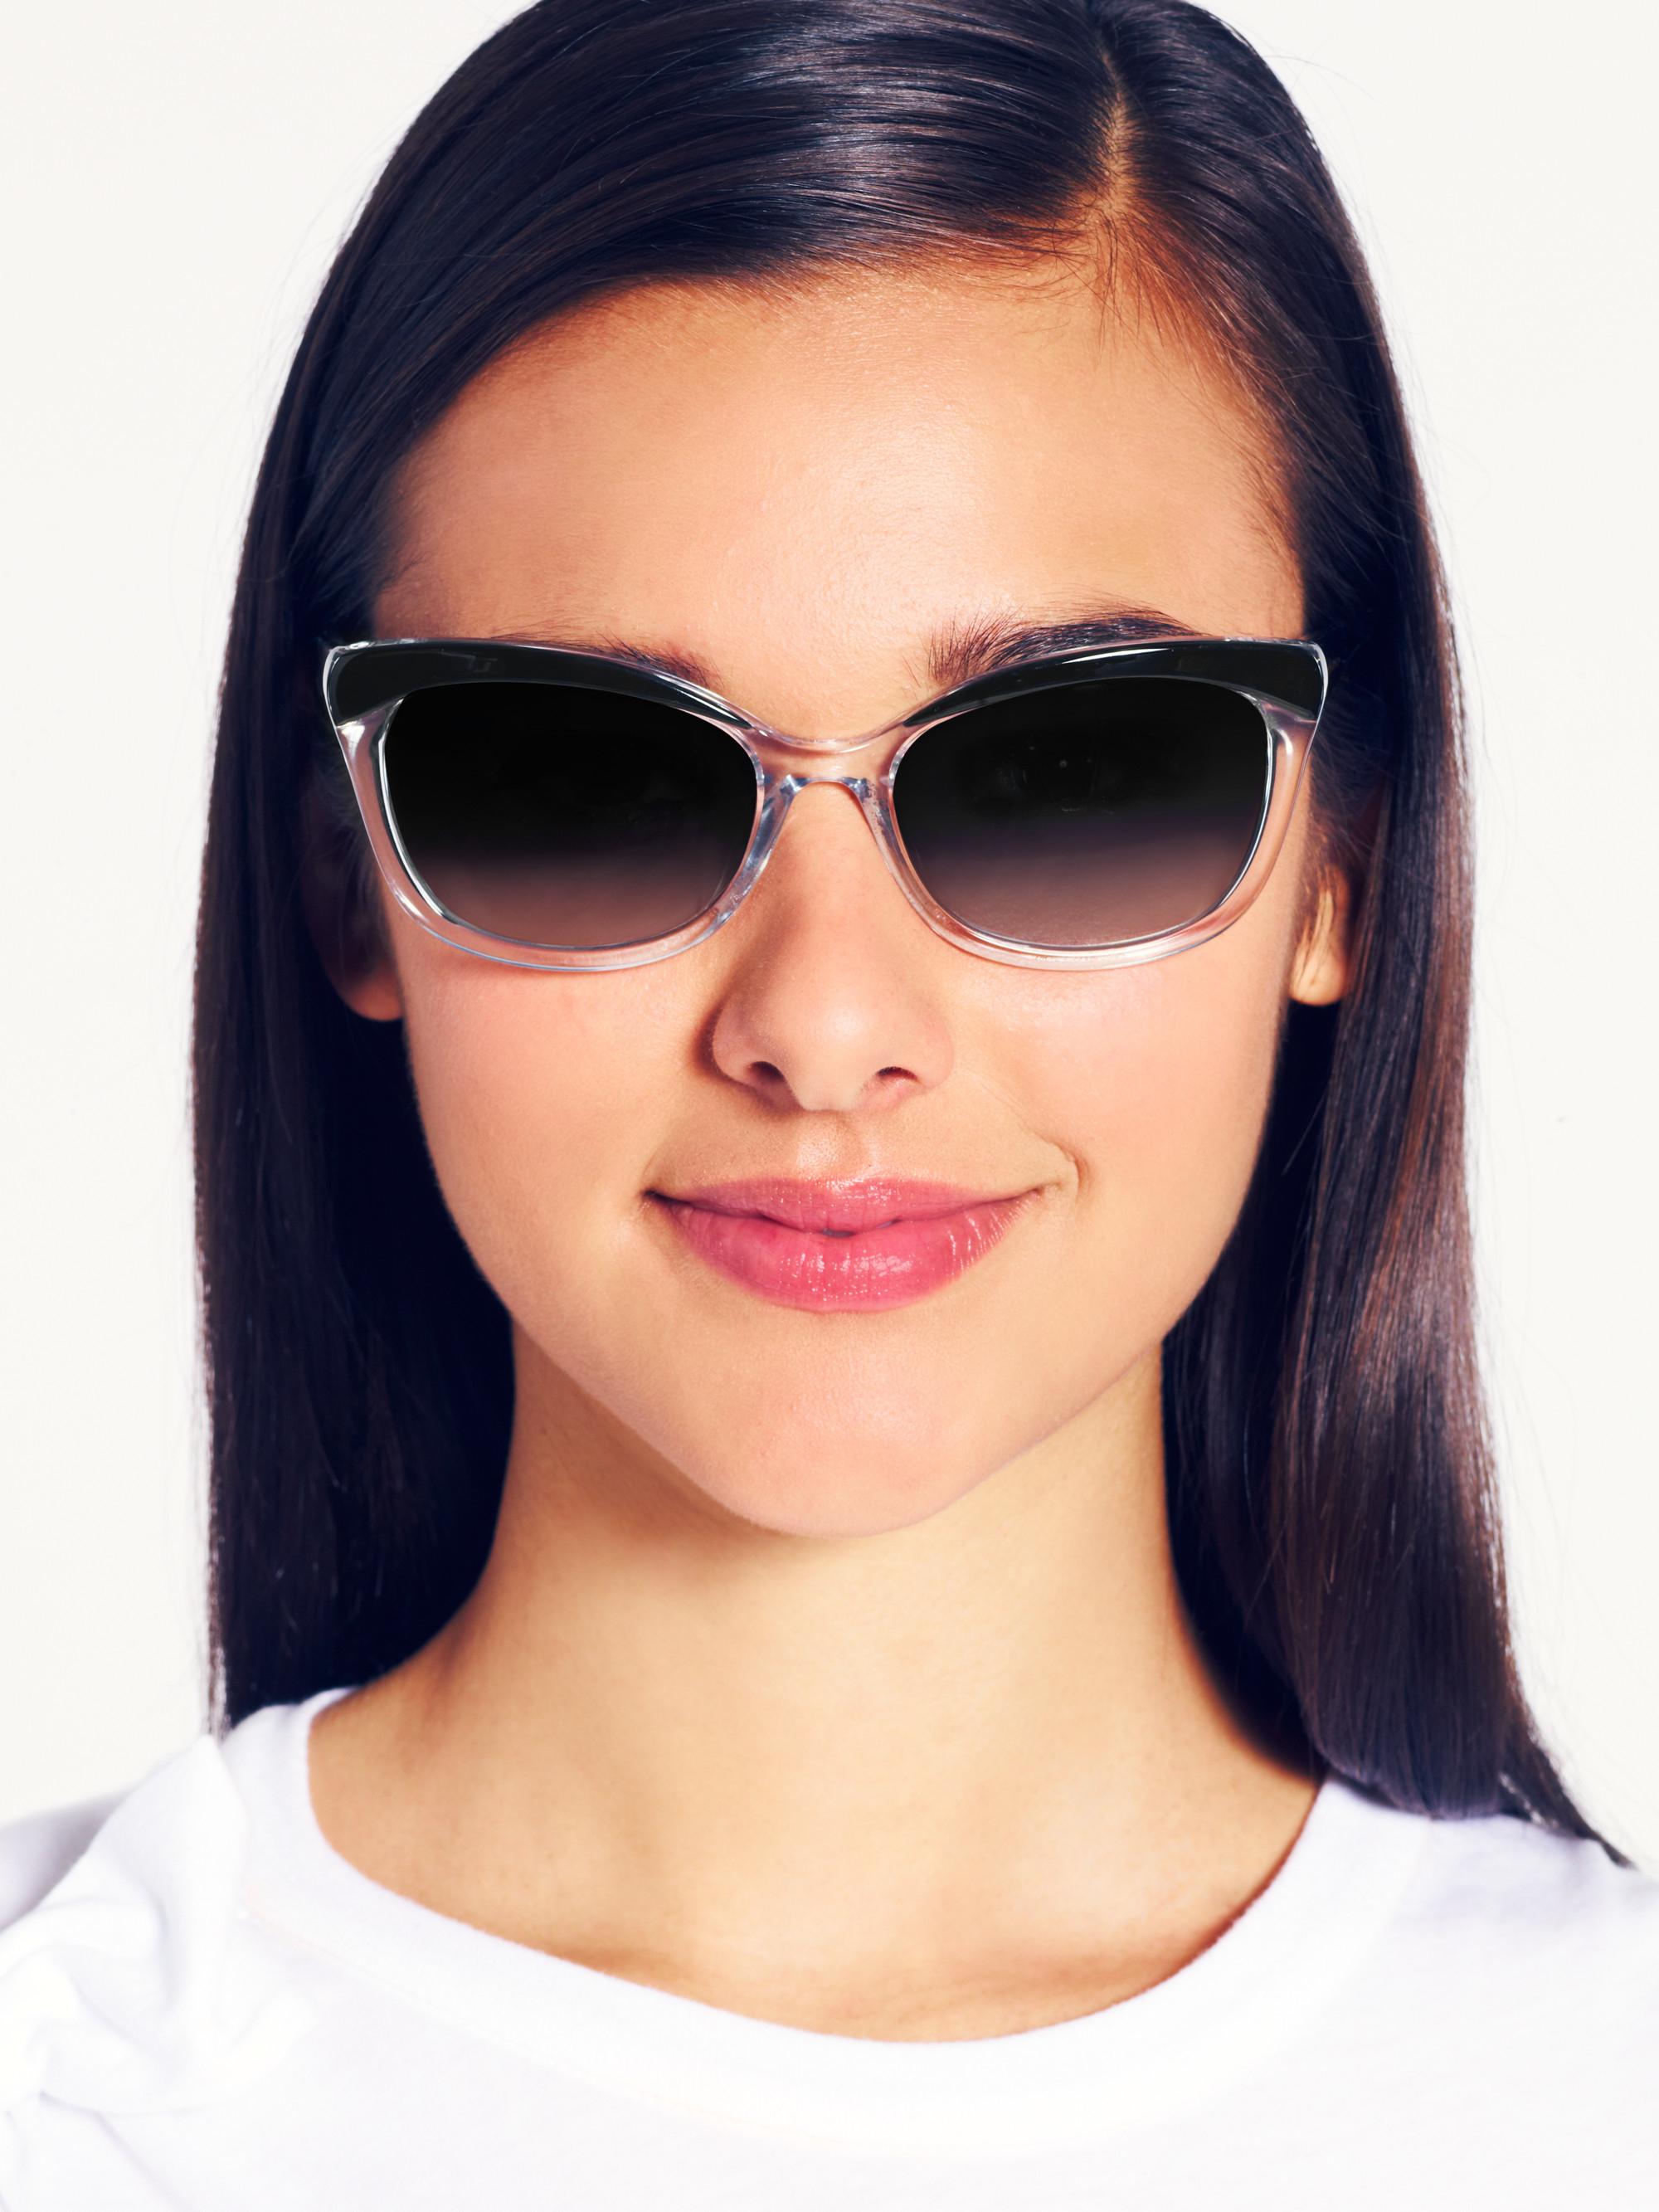 05bfdc768d43 Kate Spade Amara Sunglasses in Black - Lyst